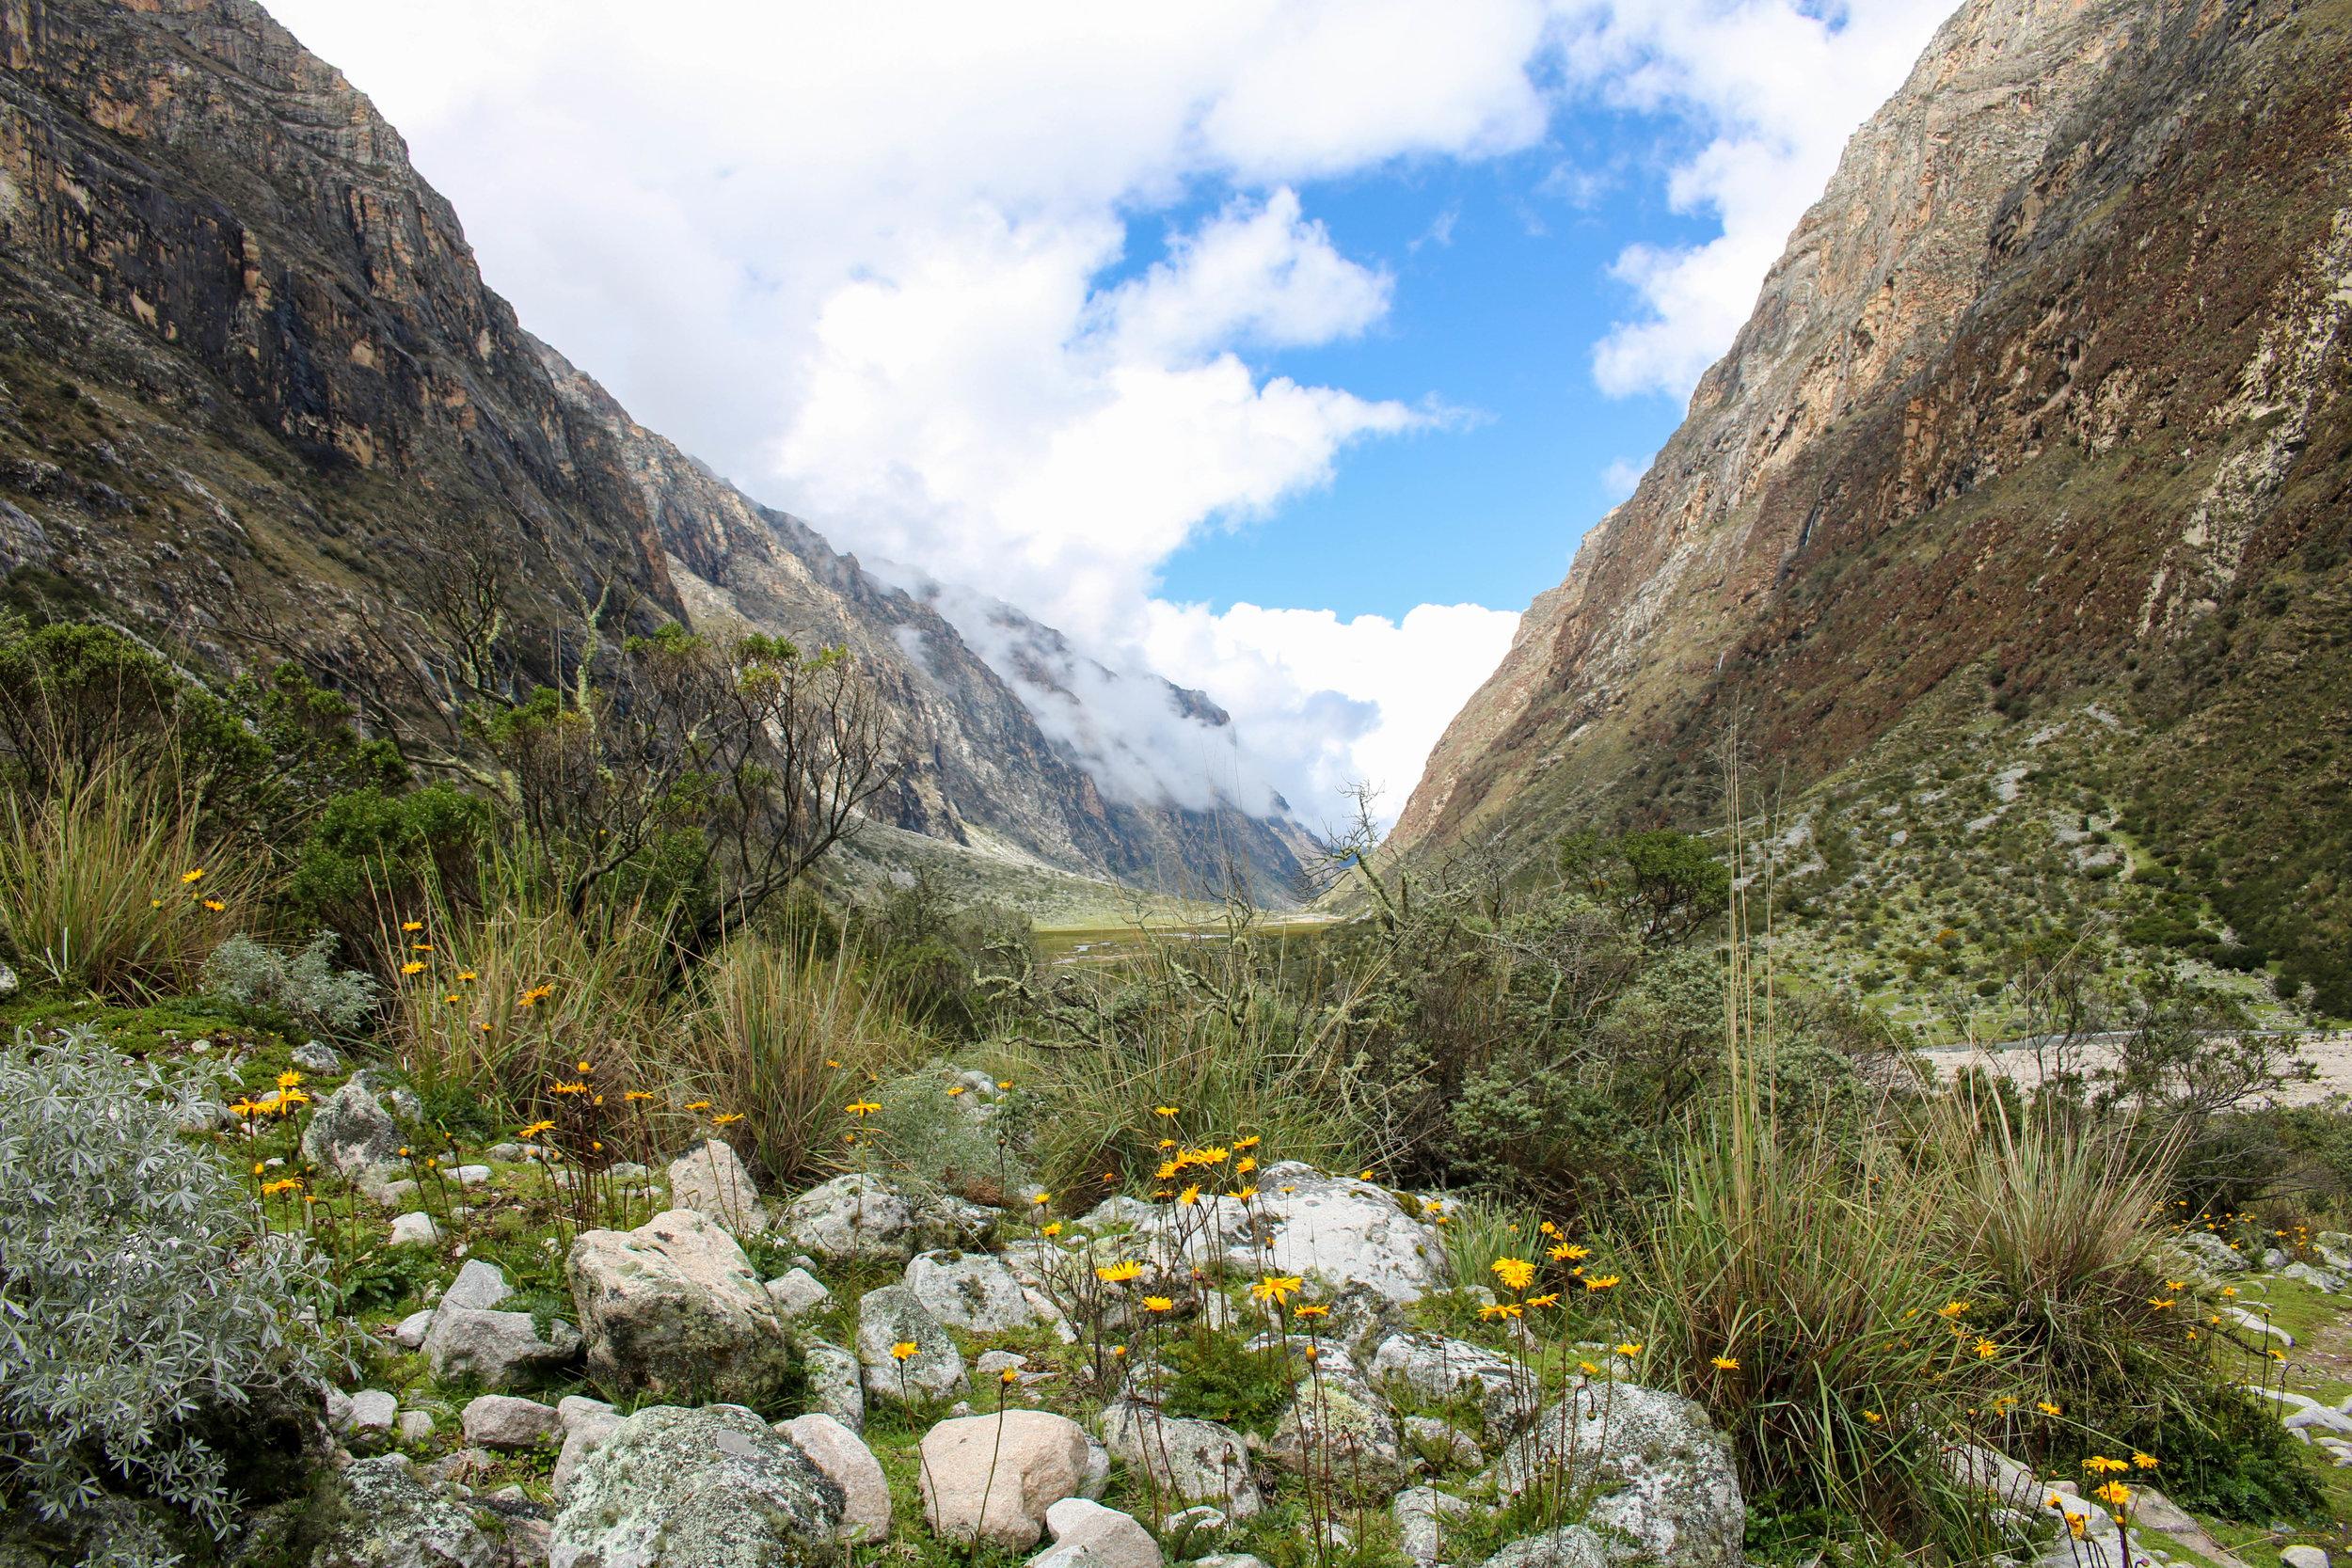 Wildflowers in the Valley, Peru